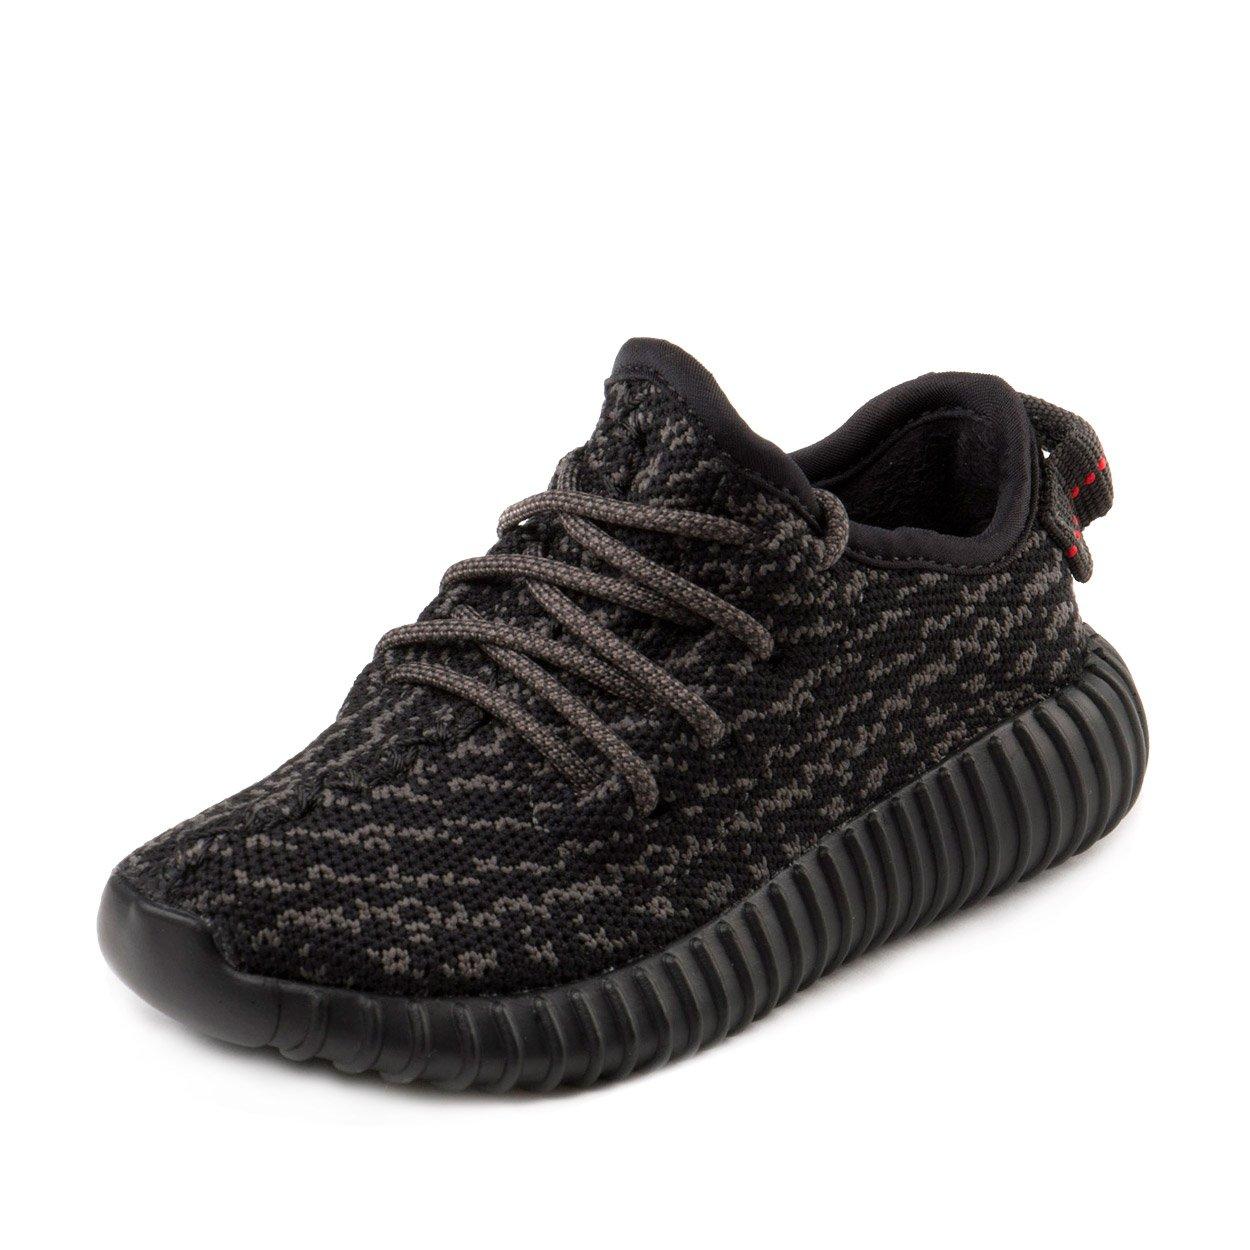 Adidas Baby Boys Yeezy Boost 350 Infant Pirate Black Pirate Black Fabric Size 10K